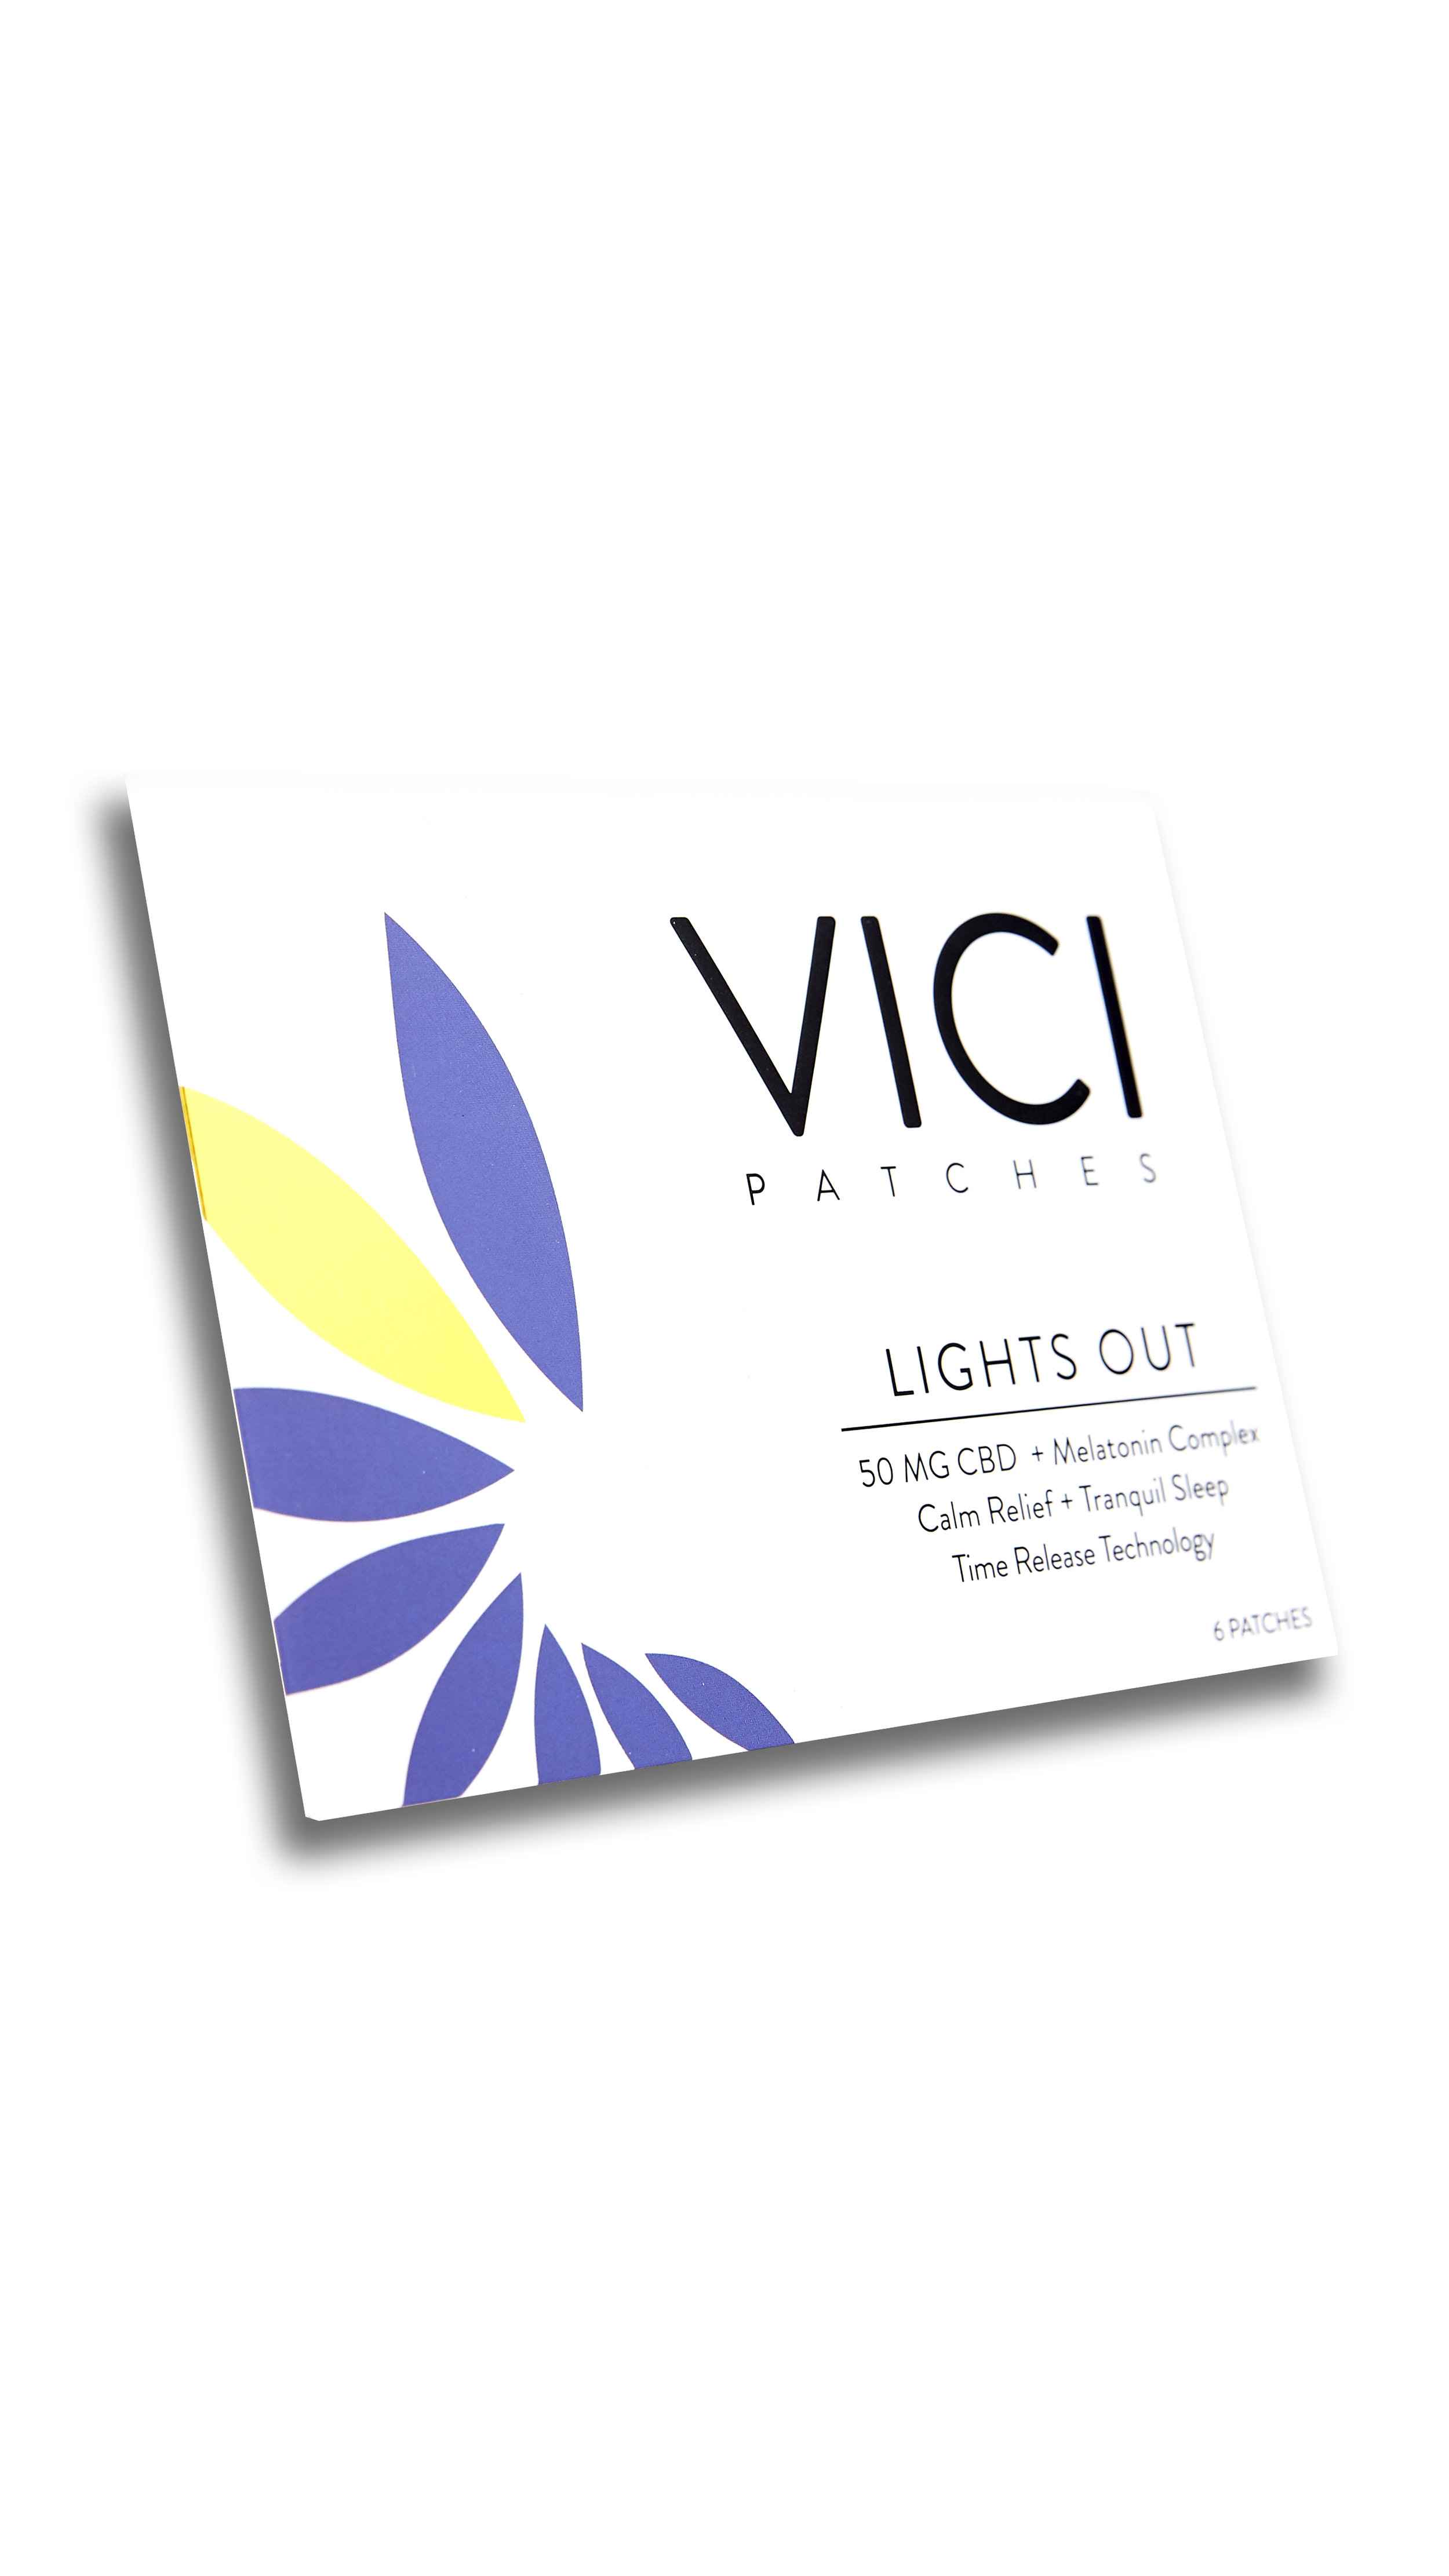 ViciLargePatch_50HEMP_Angled.jpg